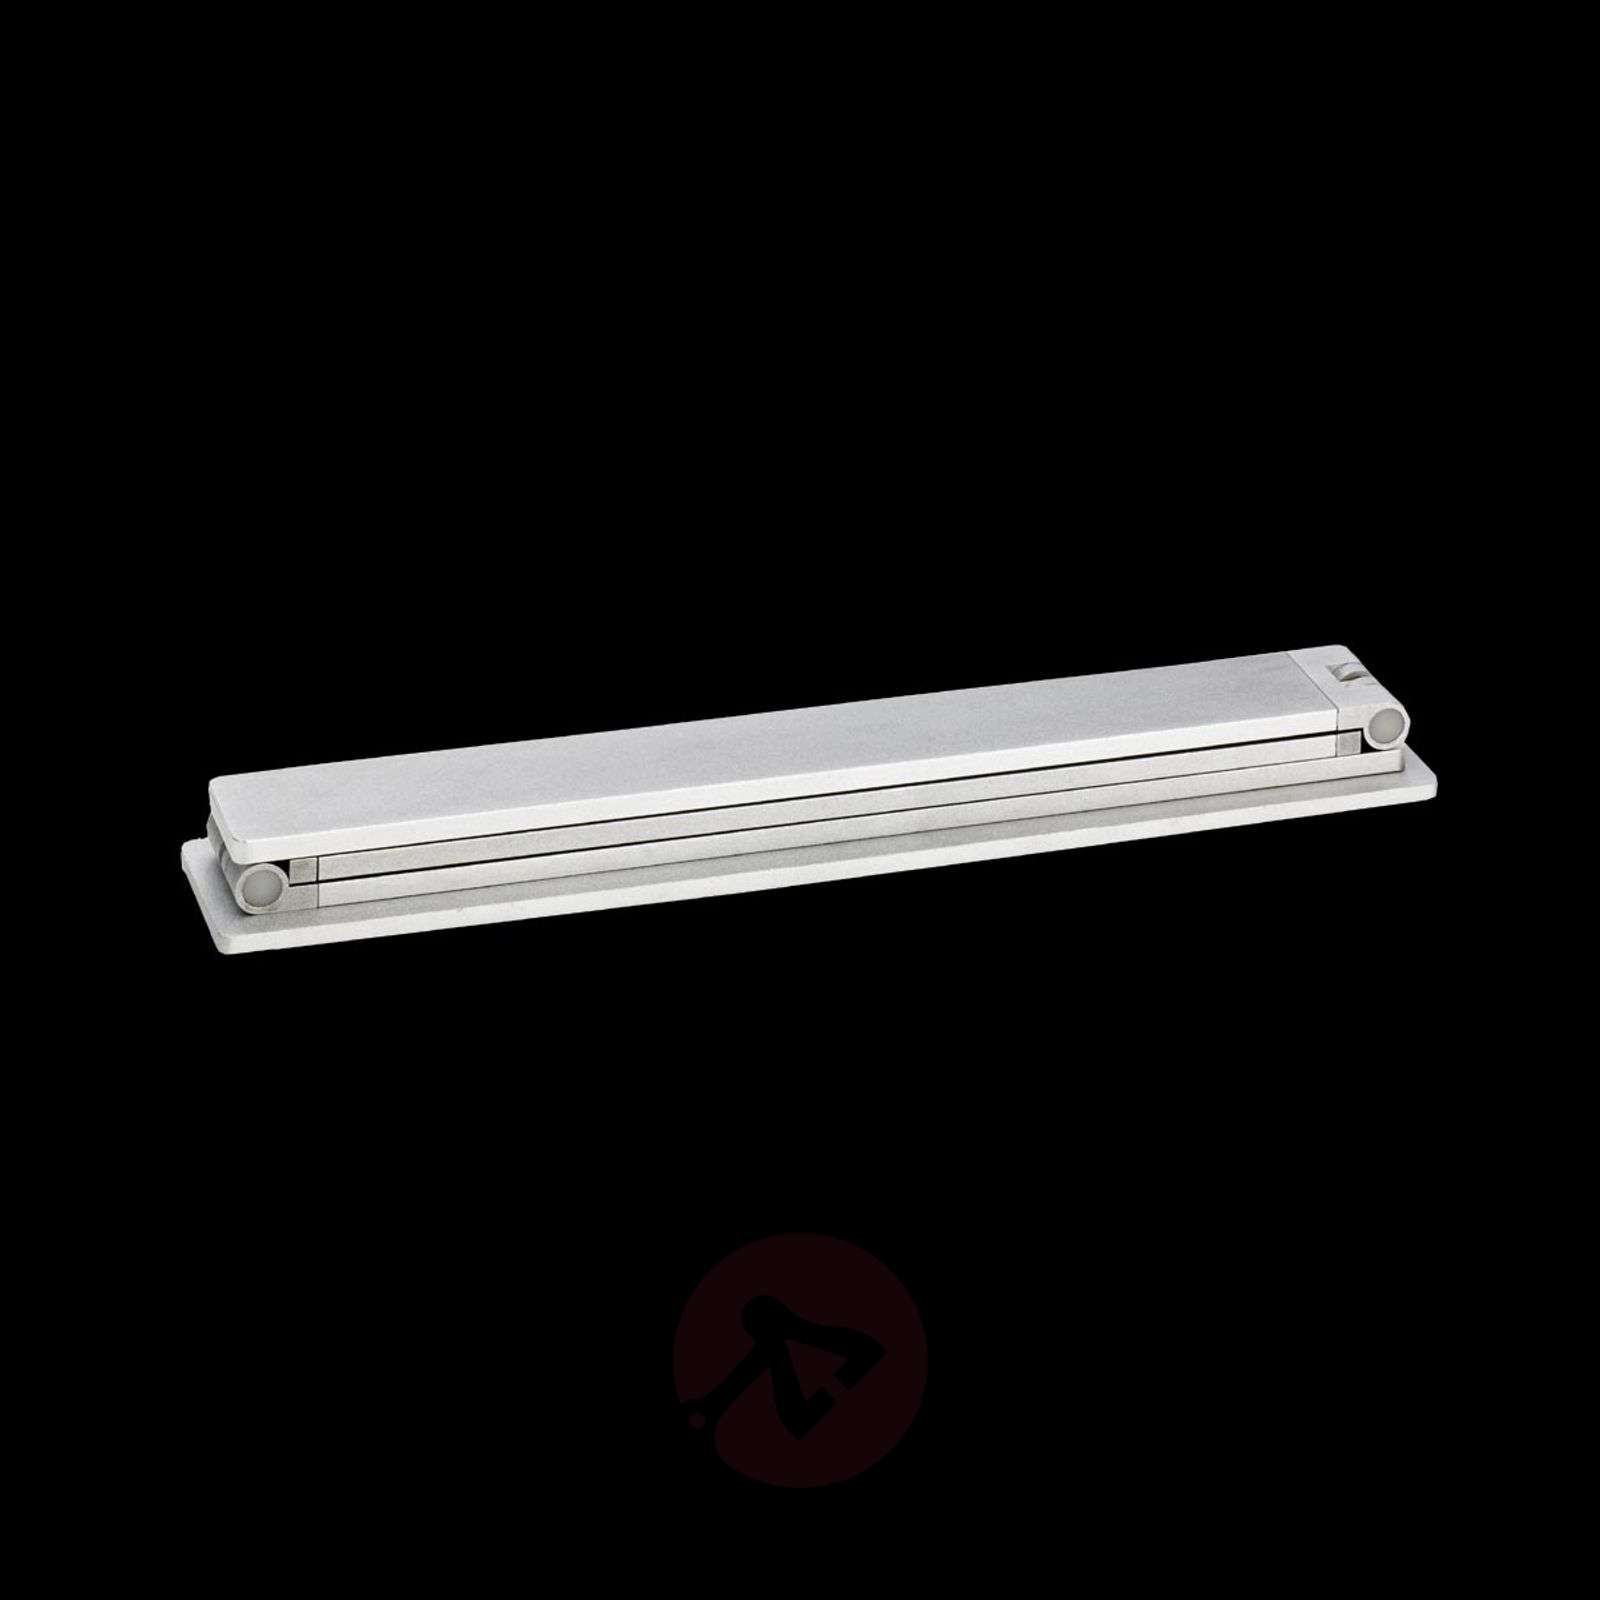 Foldable LED desk lamp Timmy-1003136-01